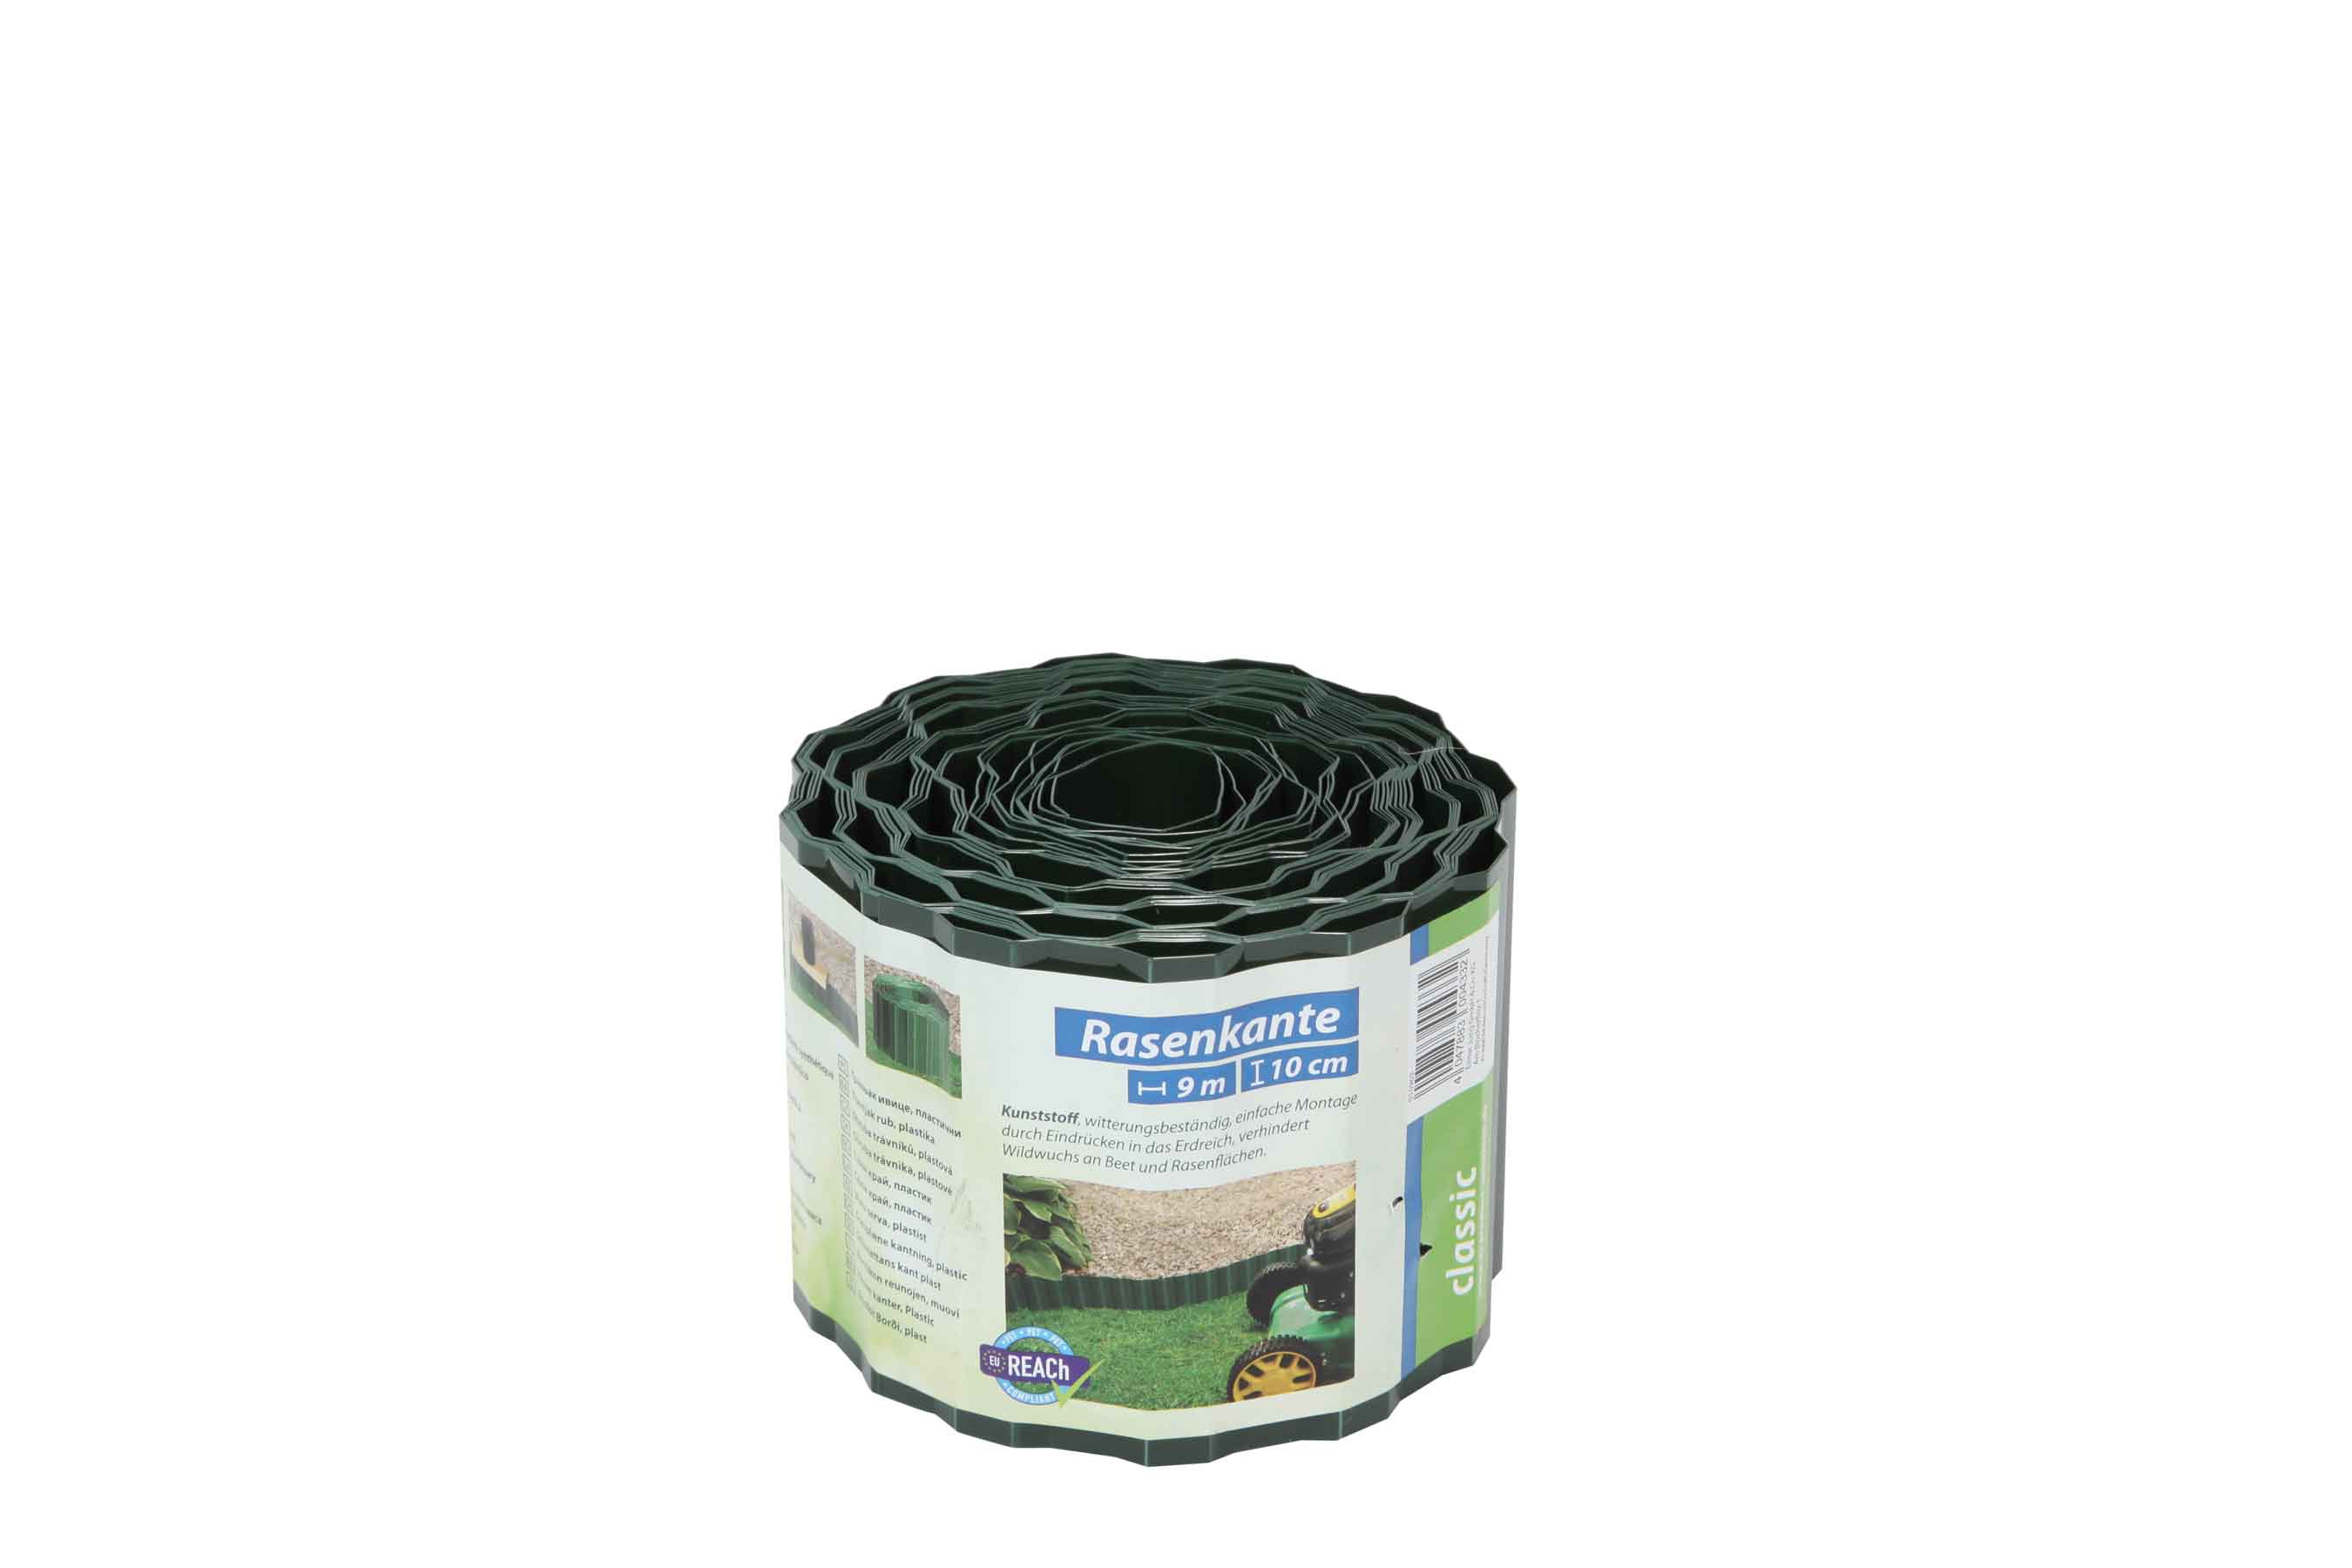 Rasenkante Kunststoff Classic floraworld 9mx10cm grün Bild 1